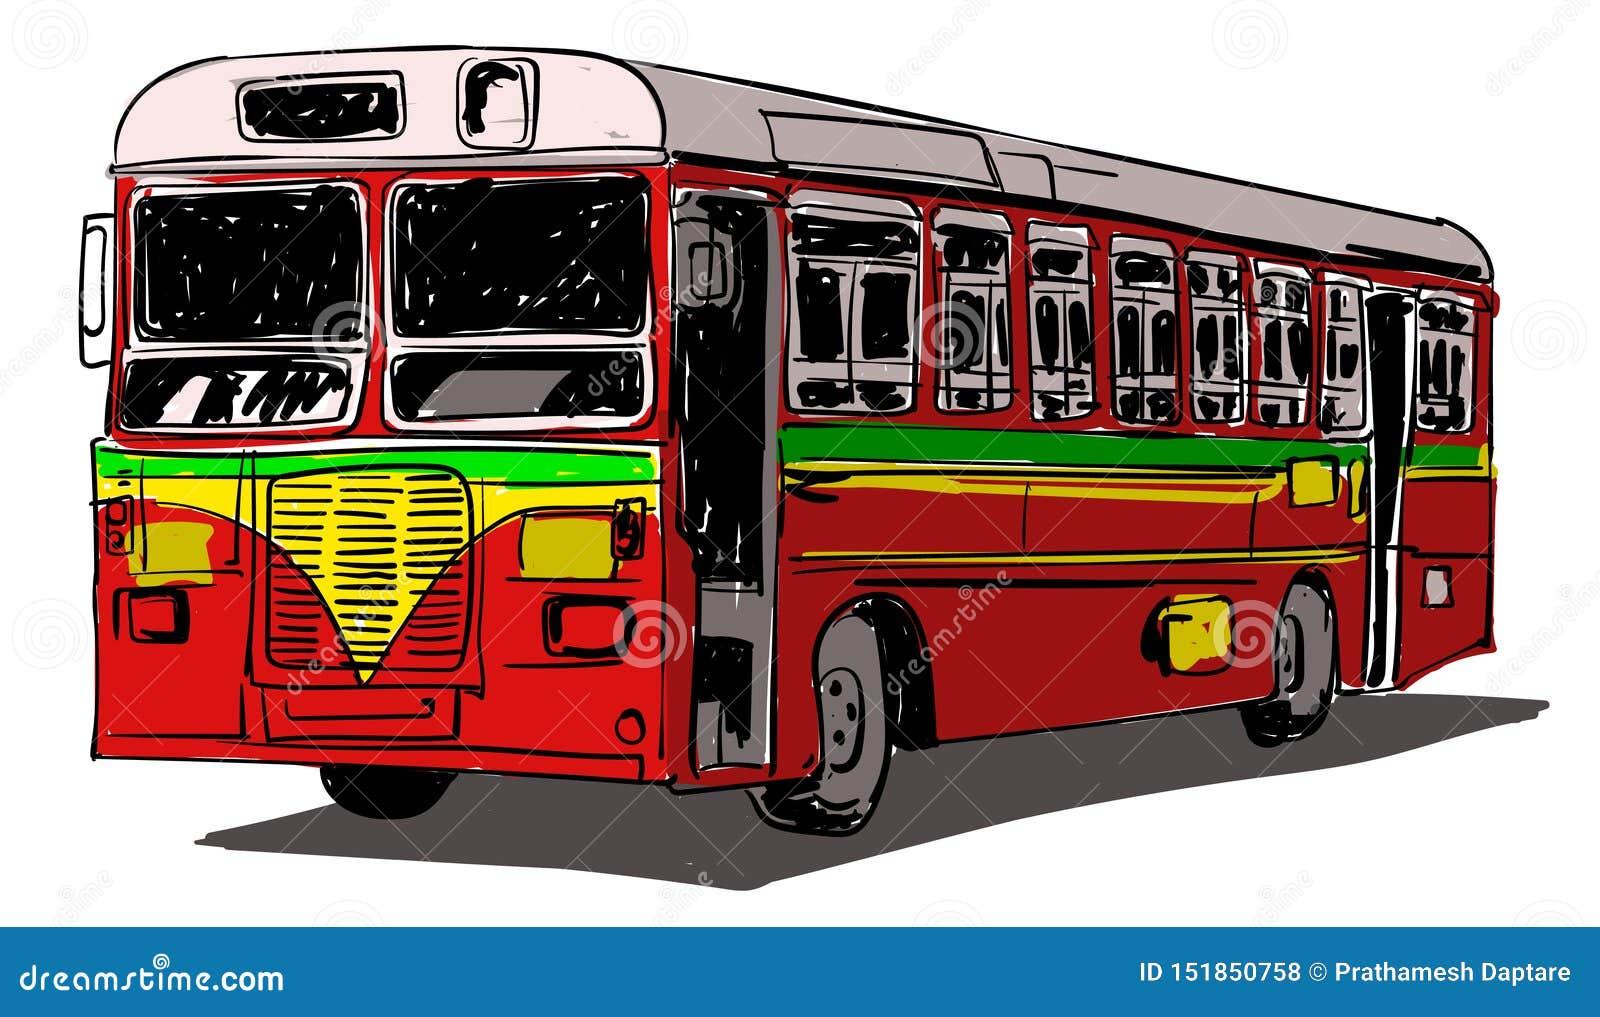 Indian Public Transport illustration